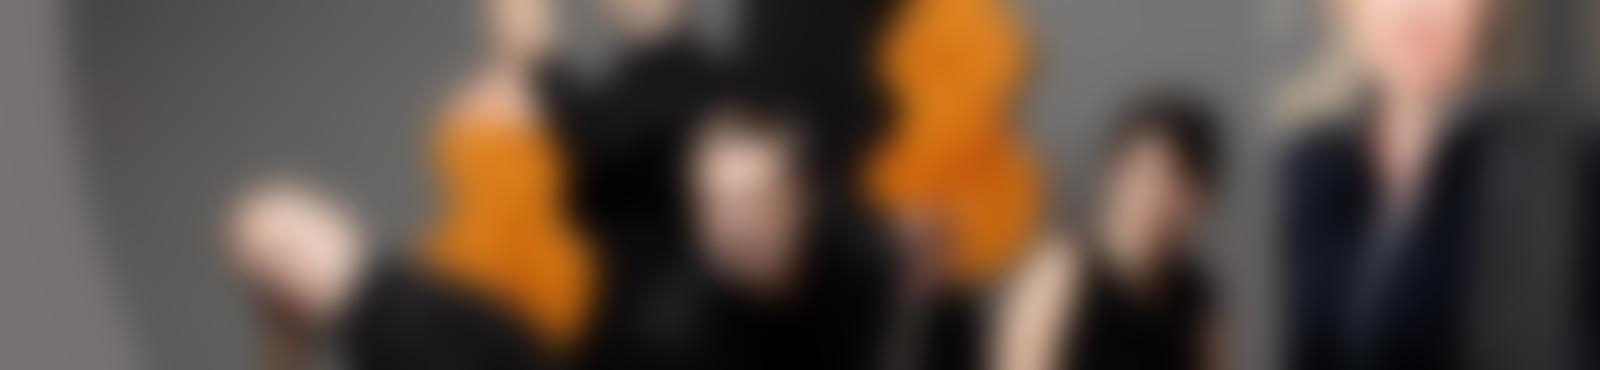 Blurred b66f2552 28ac 4de0 b4f7 75ea312e267f